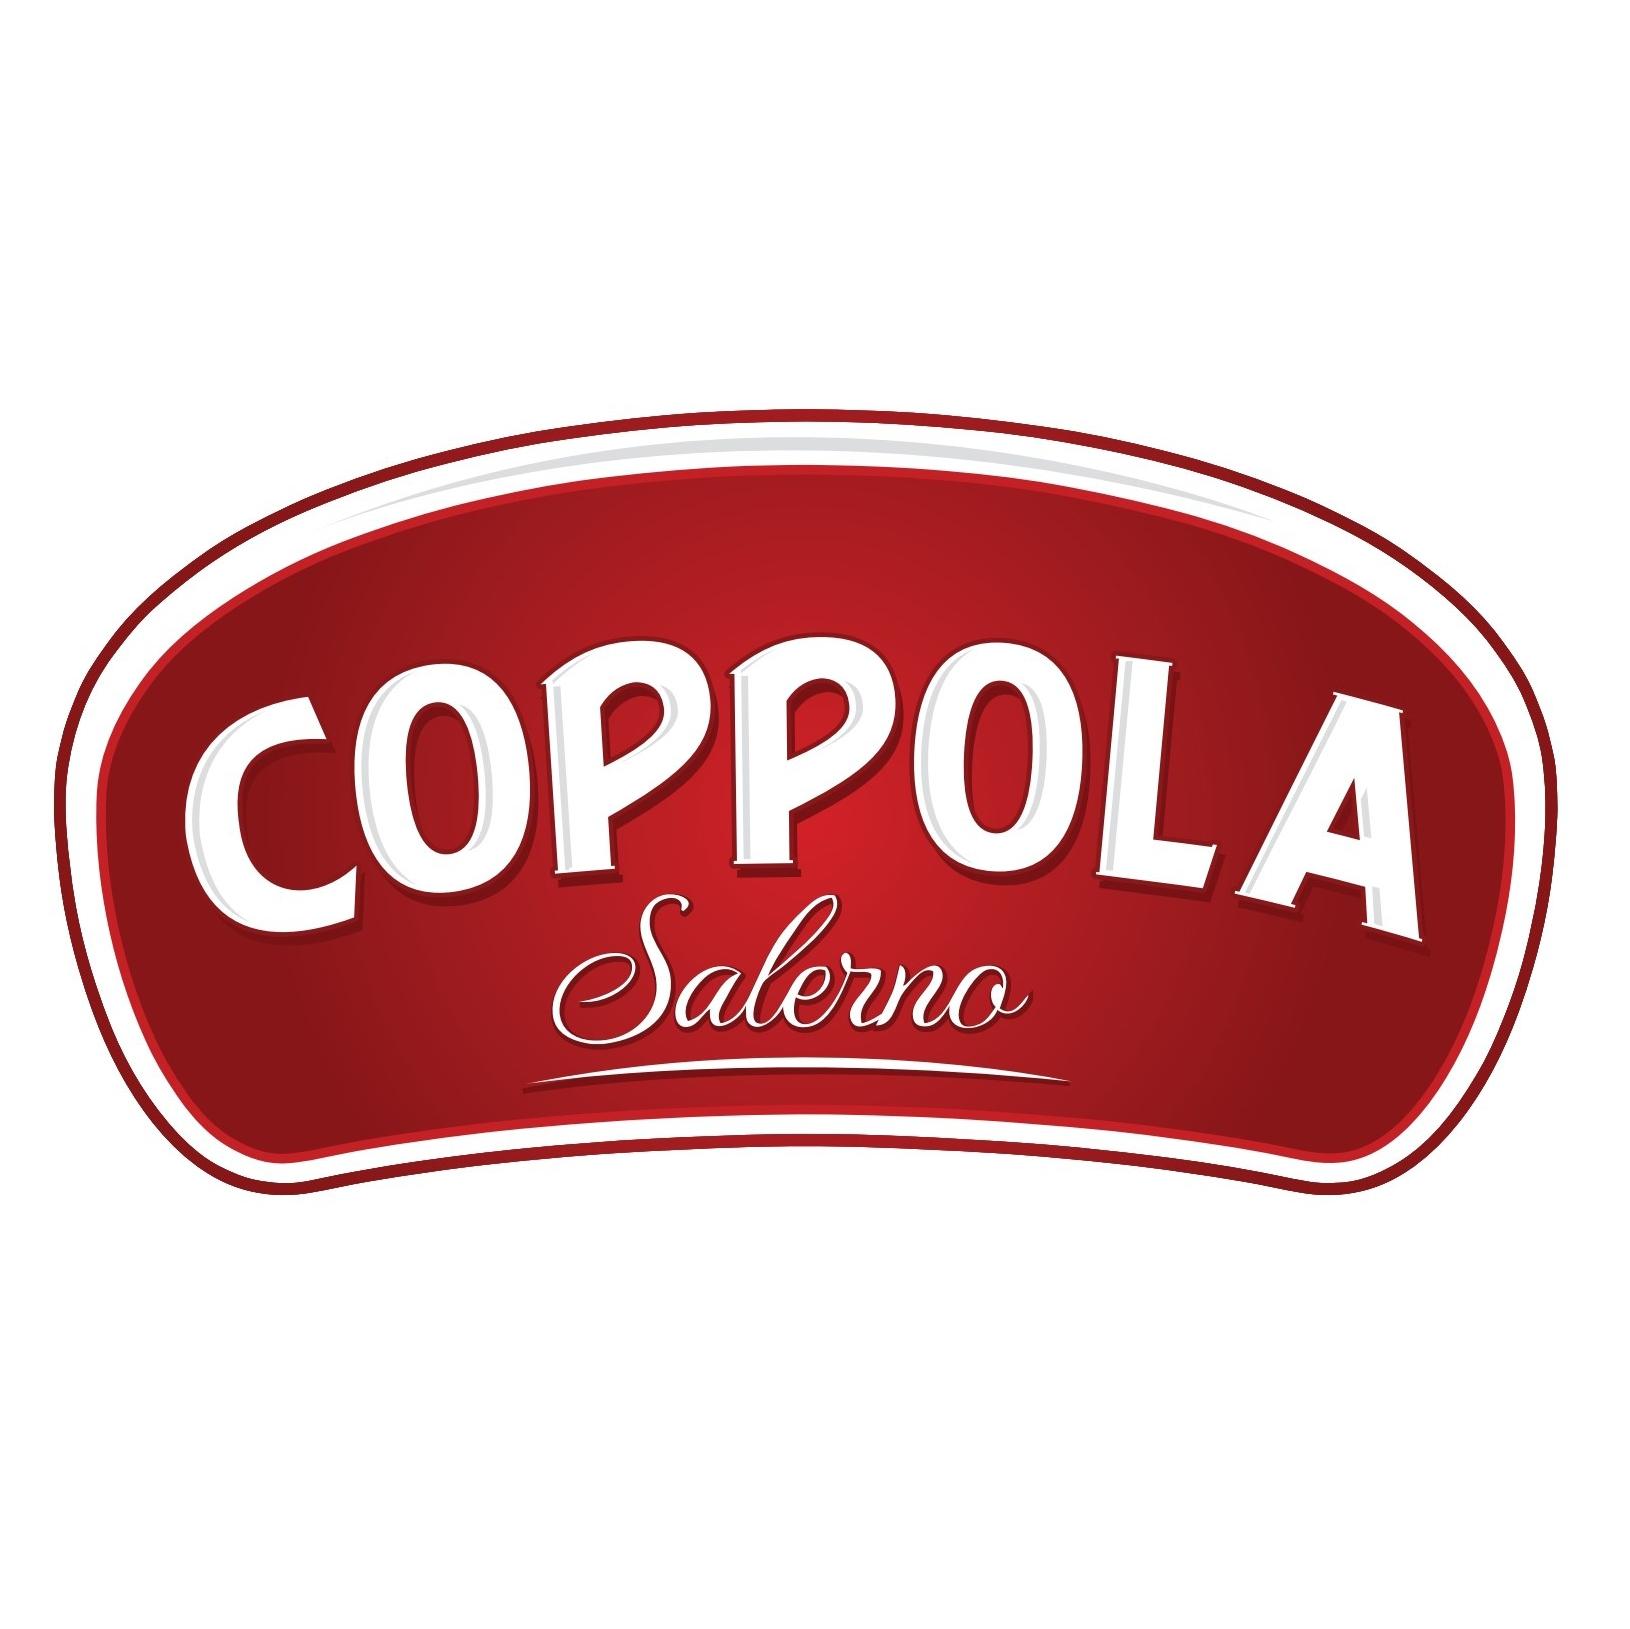 Coppola Pelati, Peeled Plum tomatoes - No Salt added, Italy, Canned vegetables, Coppola Foods